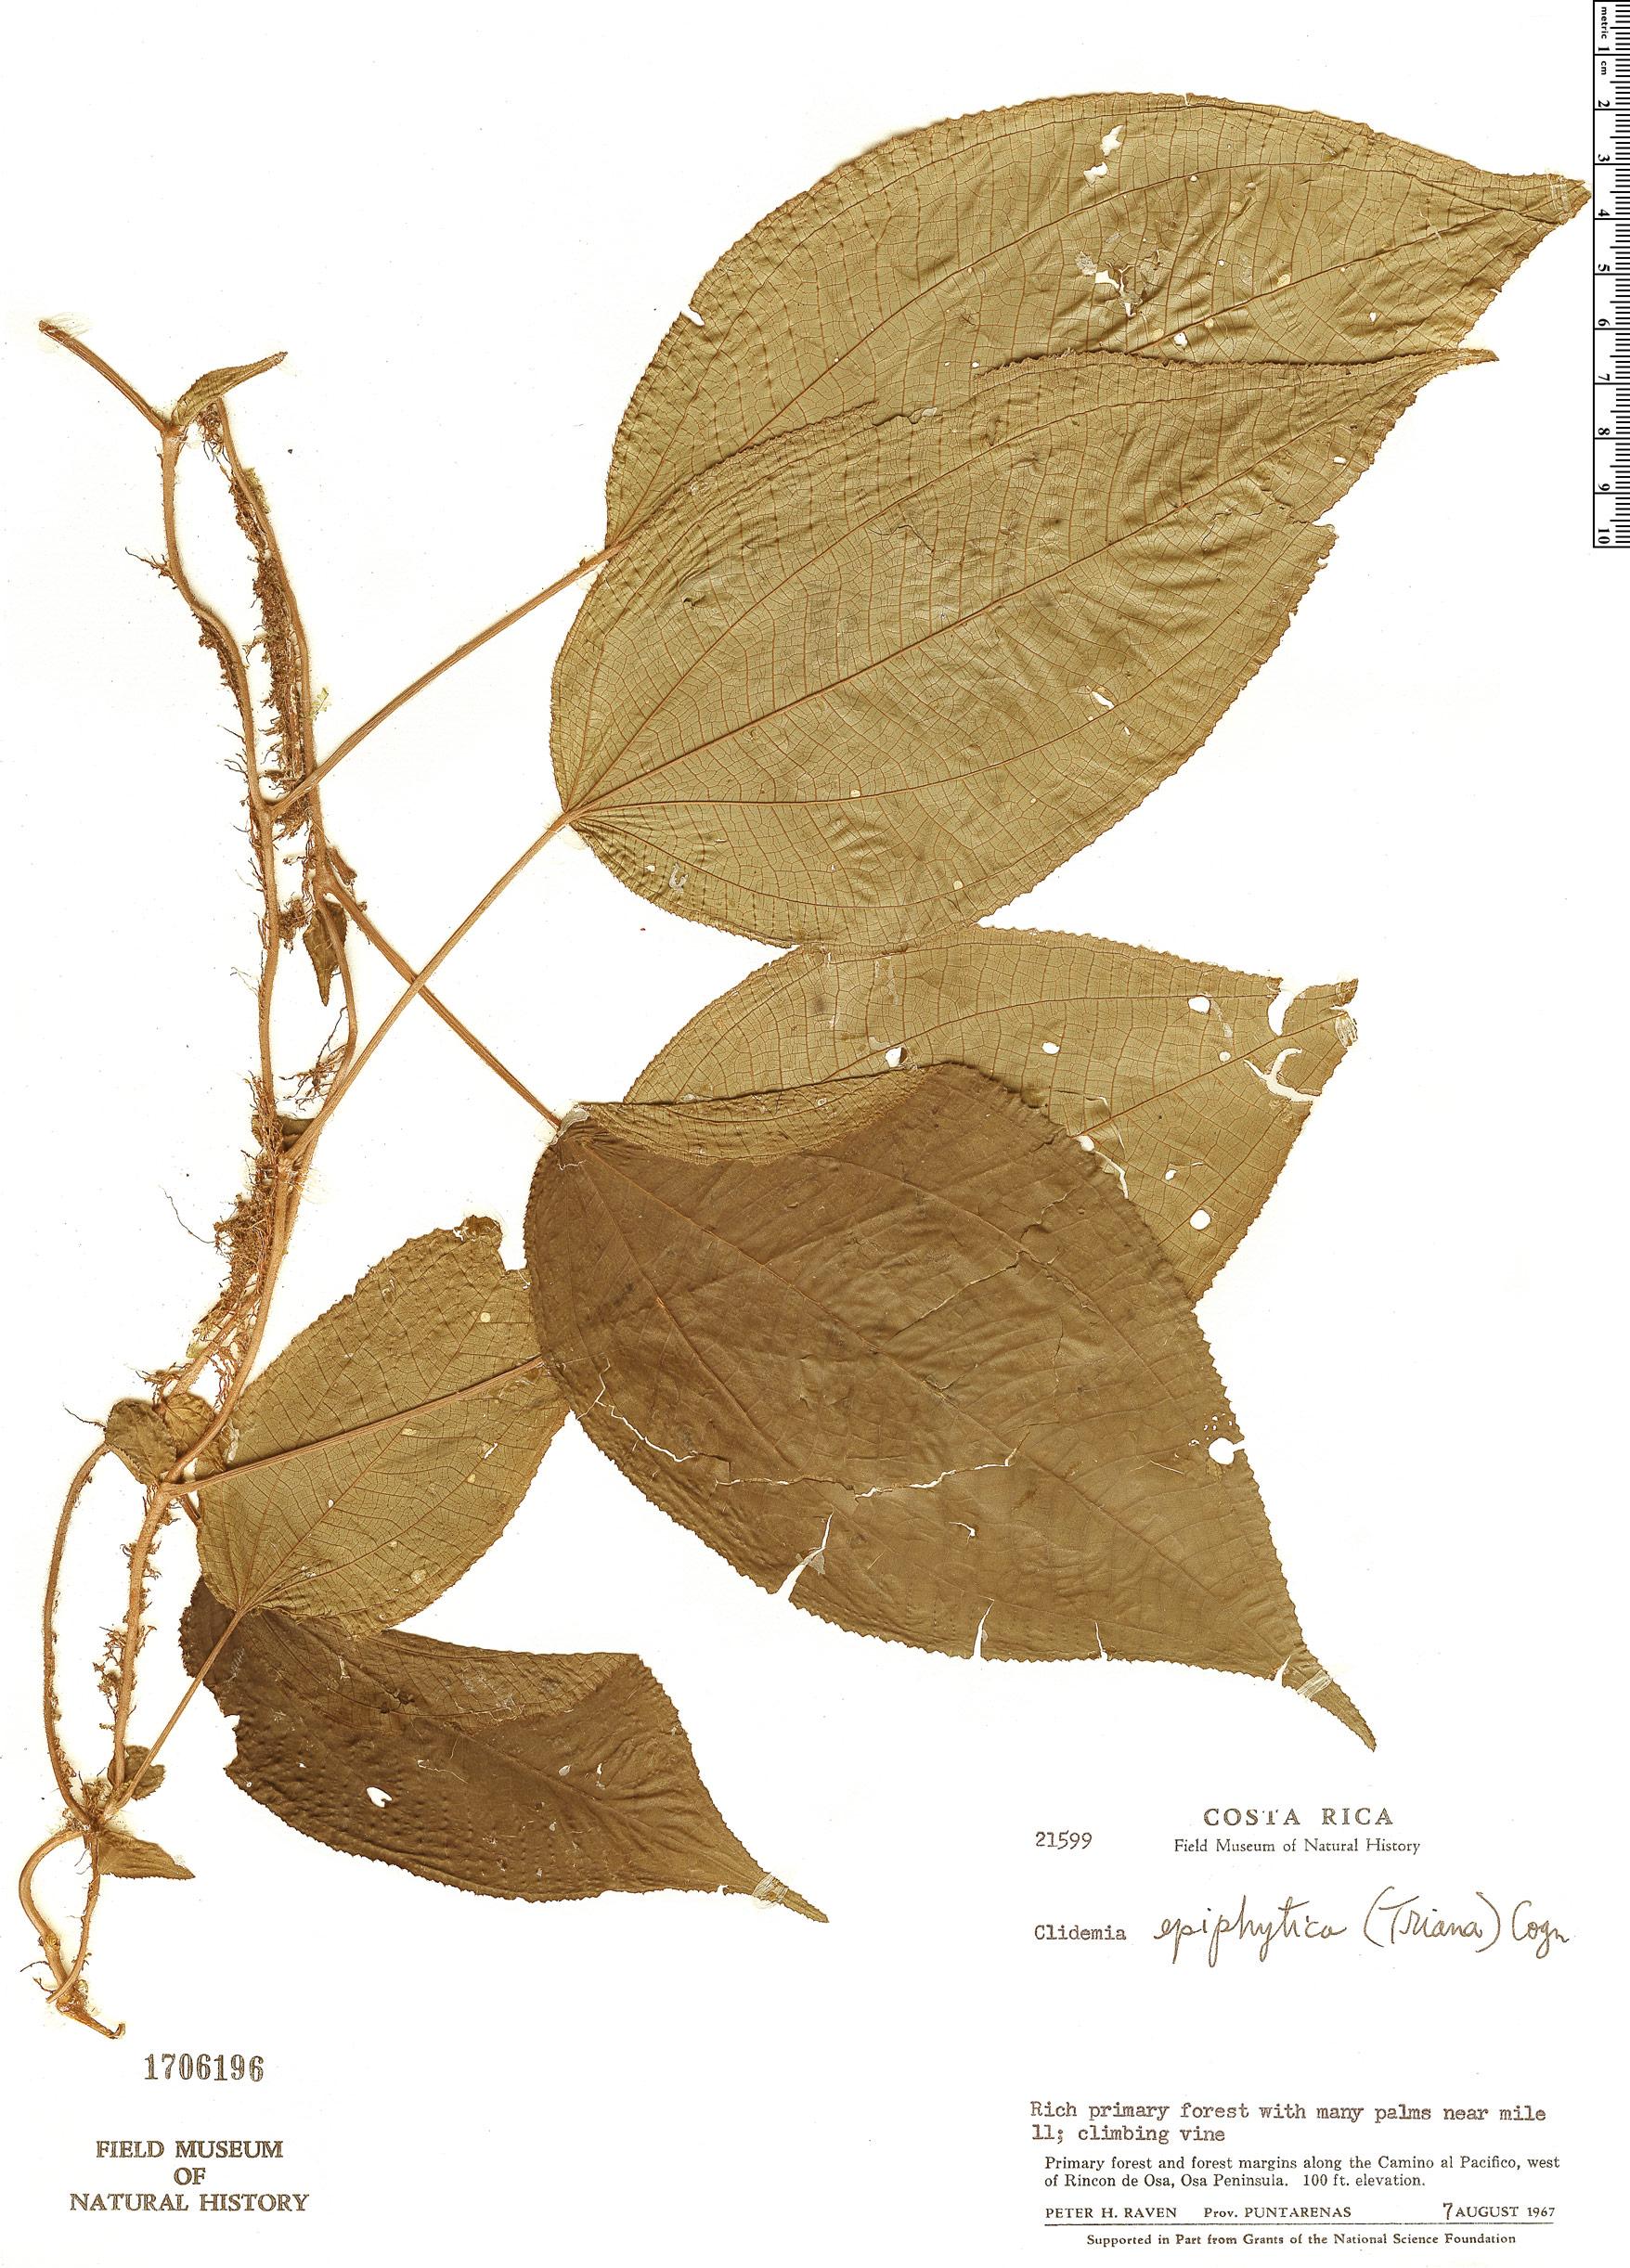 Specimen: Clidemia epiphytica